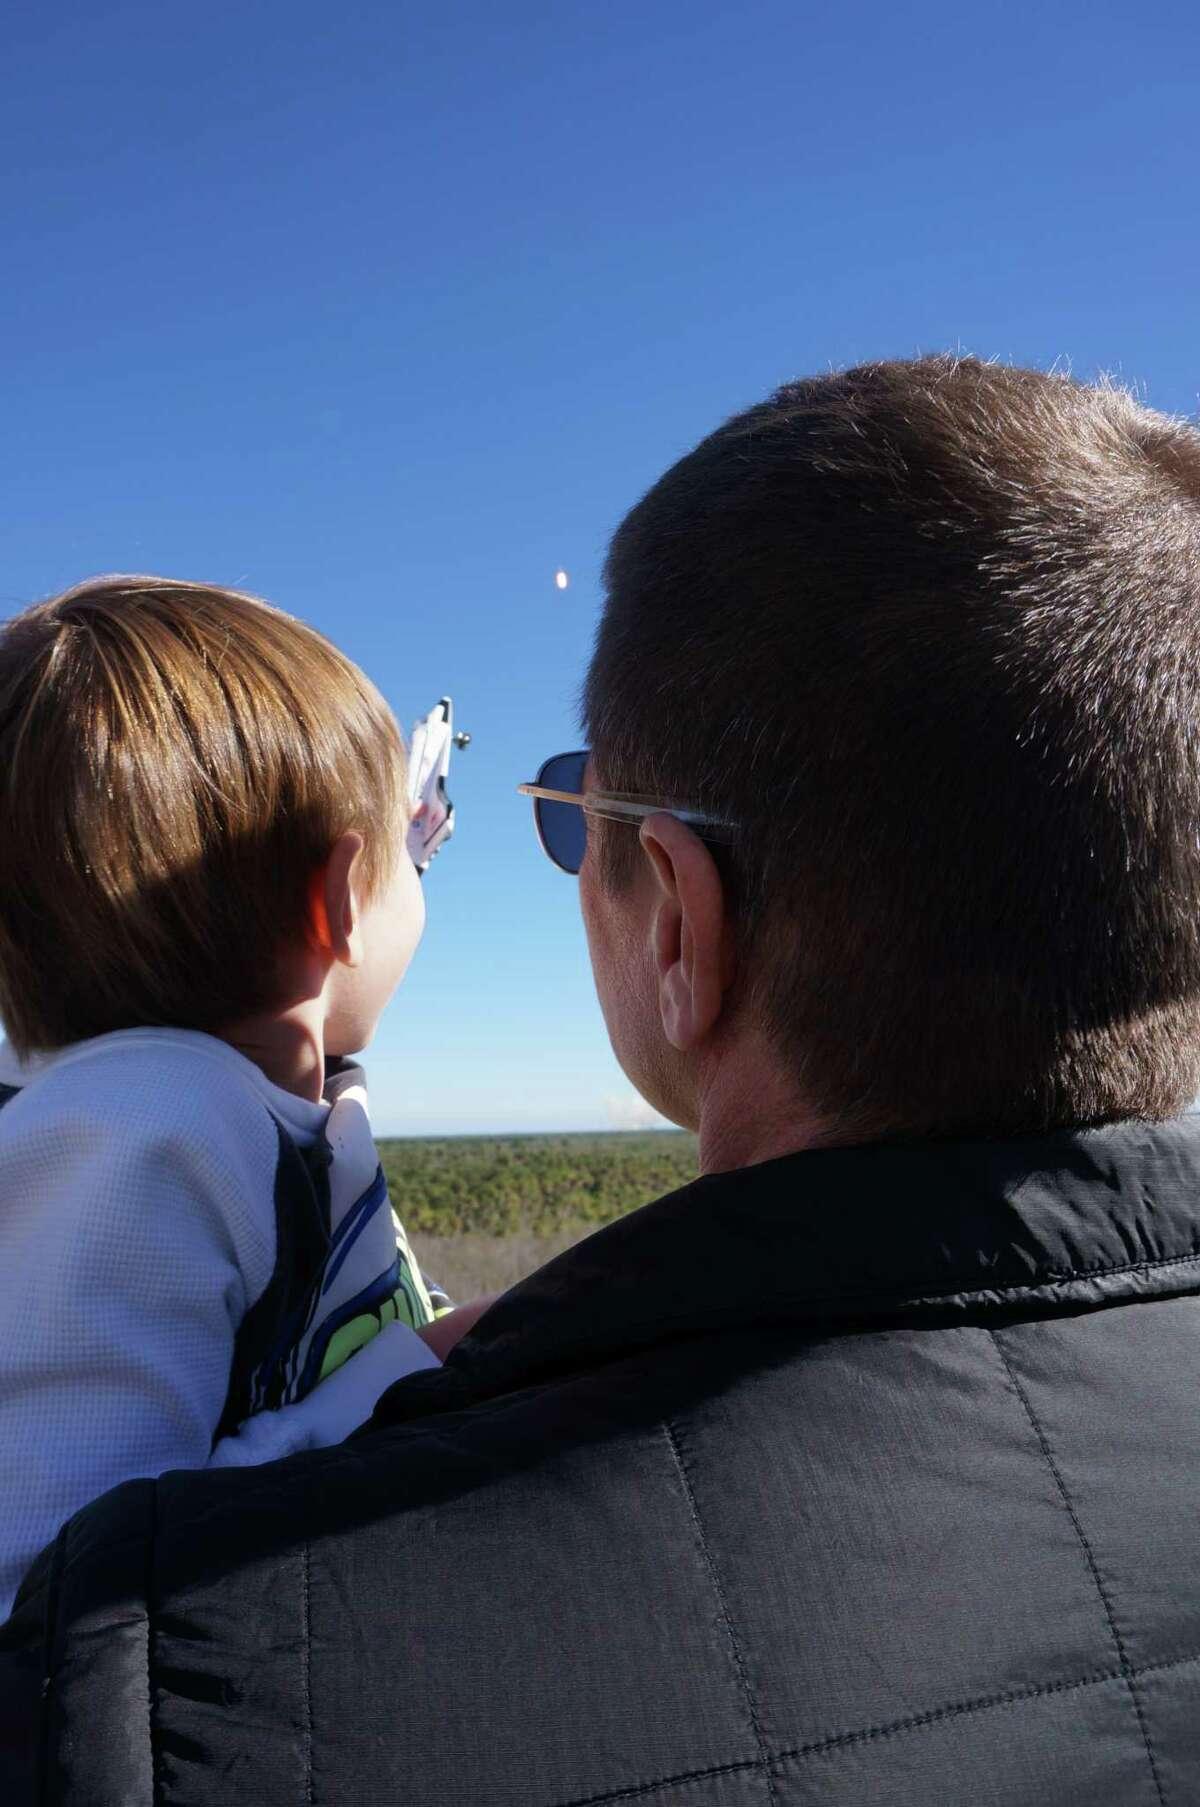 Astronaut Bob Behnken and his sonTheodore watch a SpaceX rocket launch in December 2018.